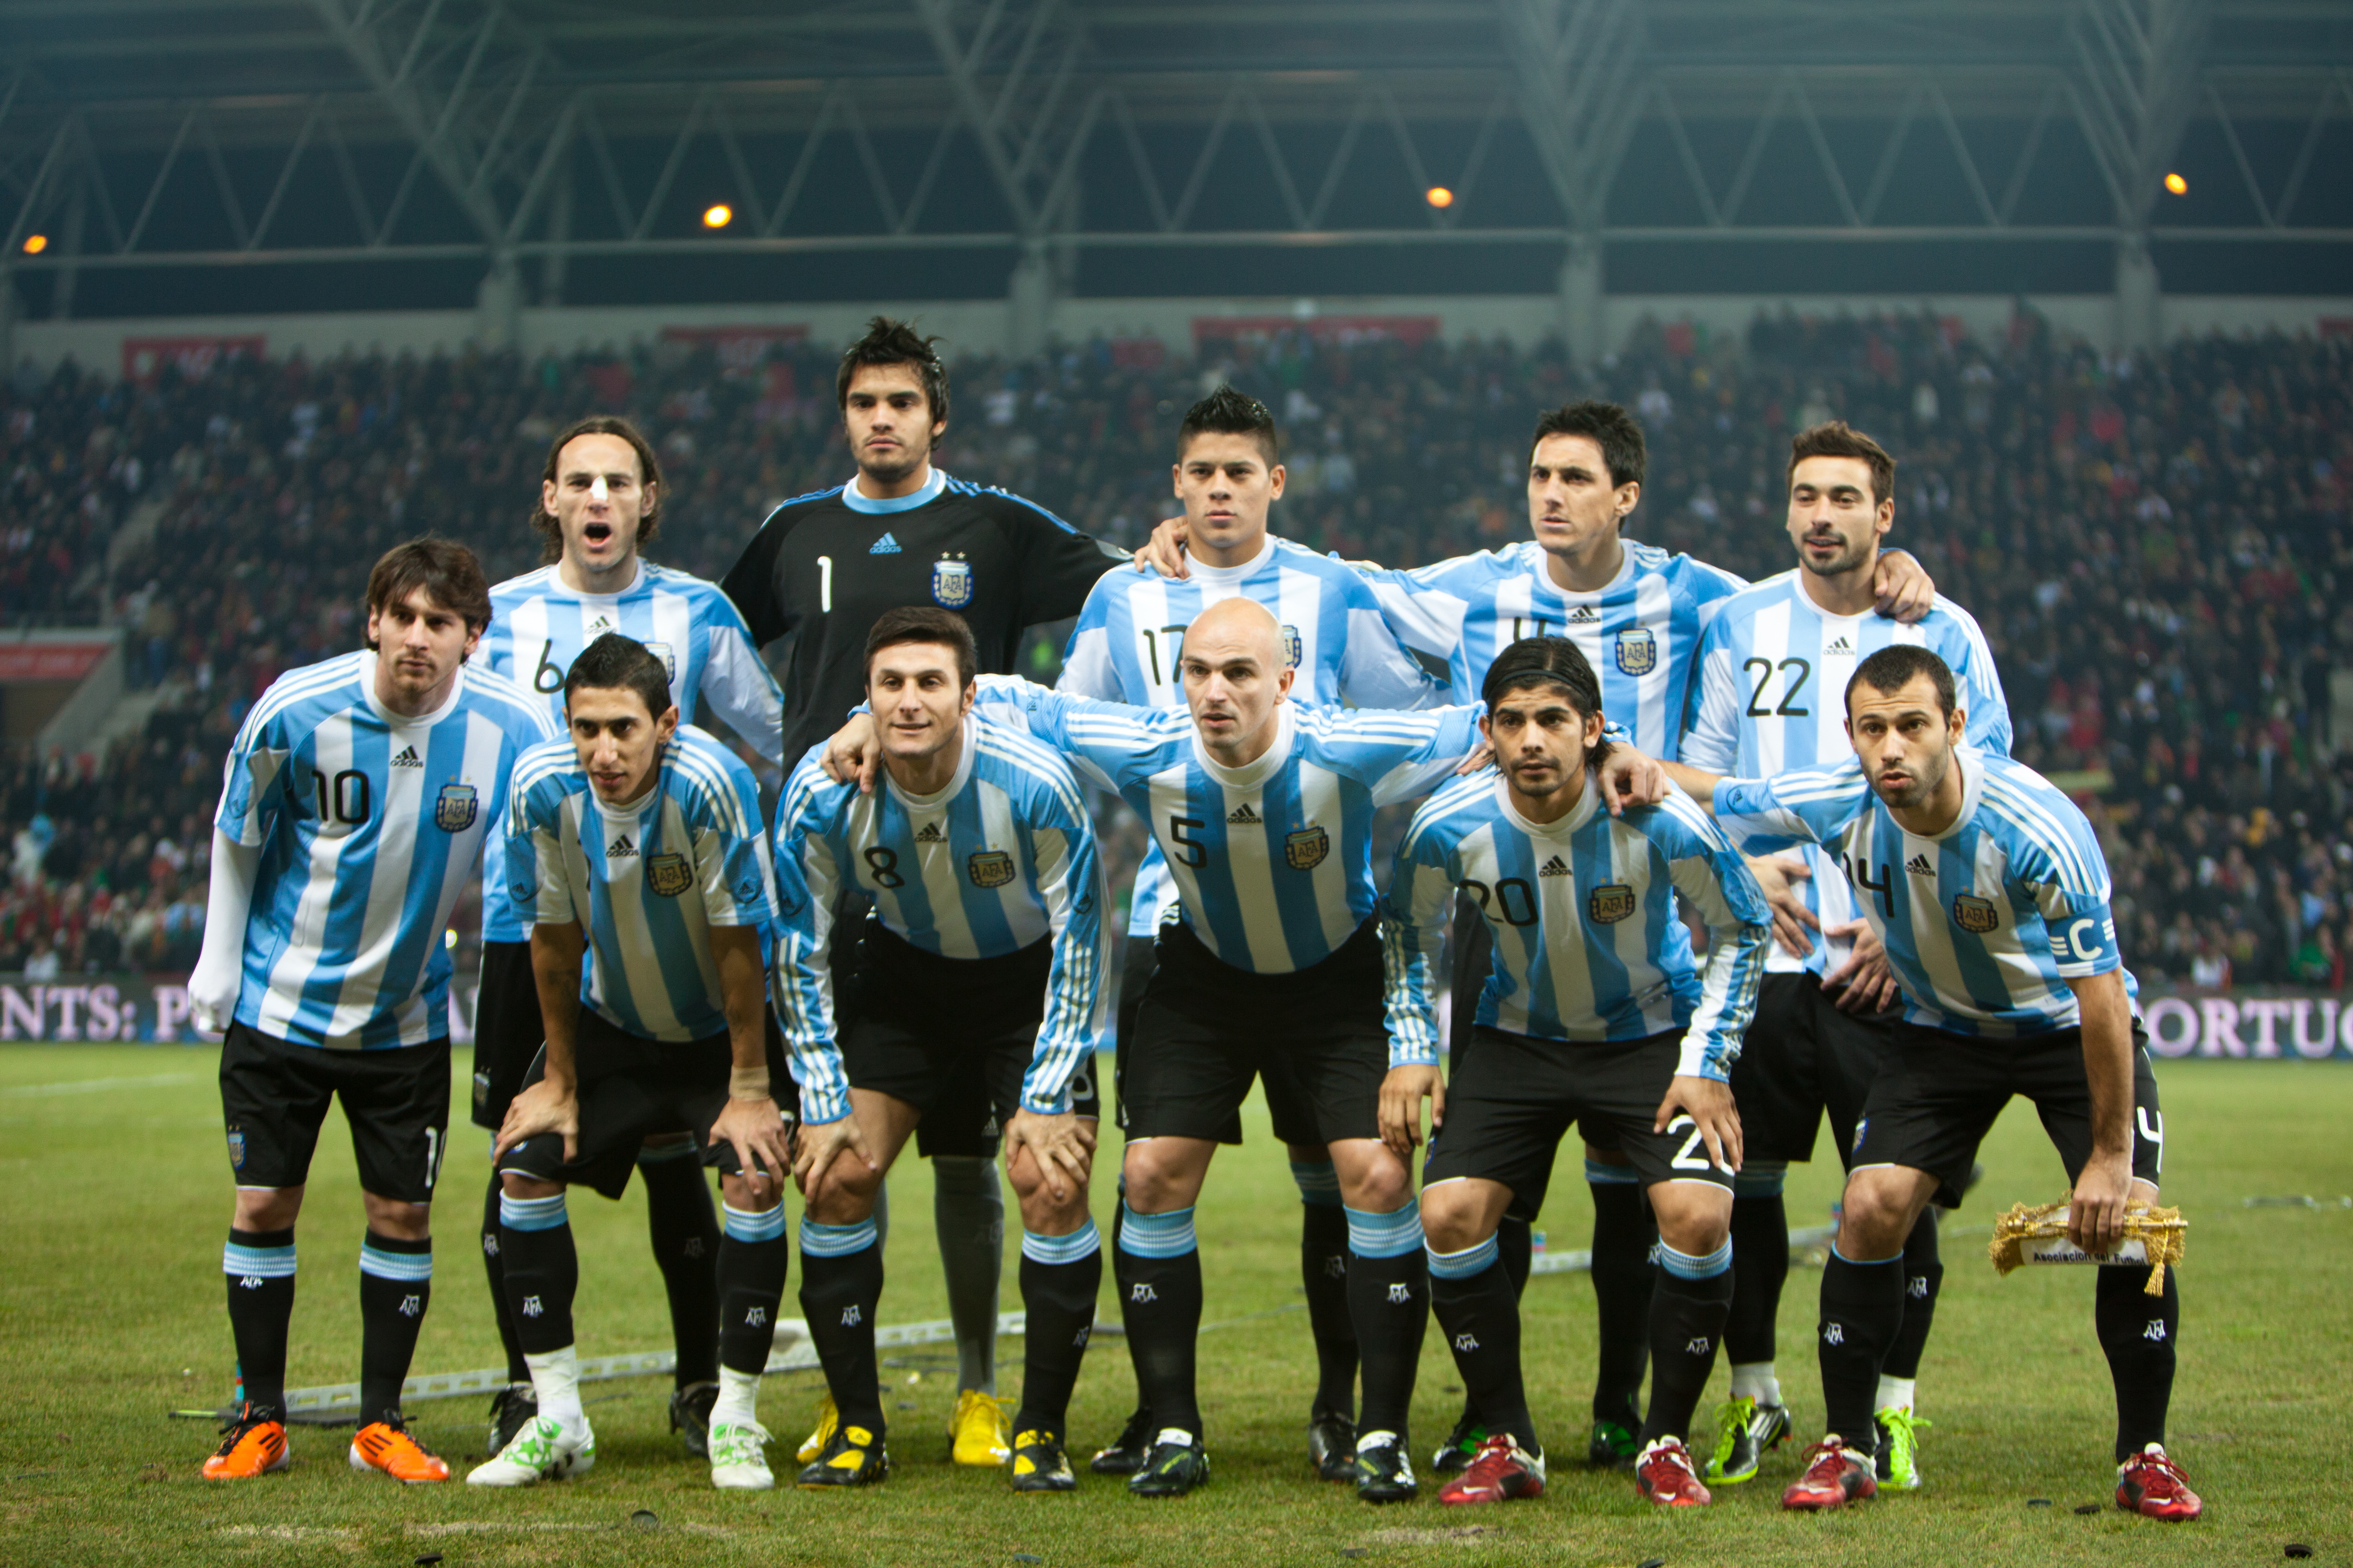 Argentina National Football Team HD Wallpaper Football Wallpapers 5089x3392